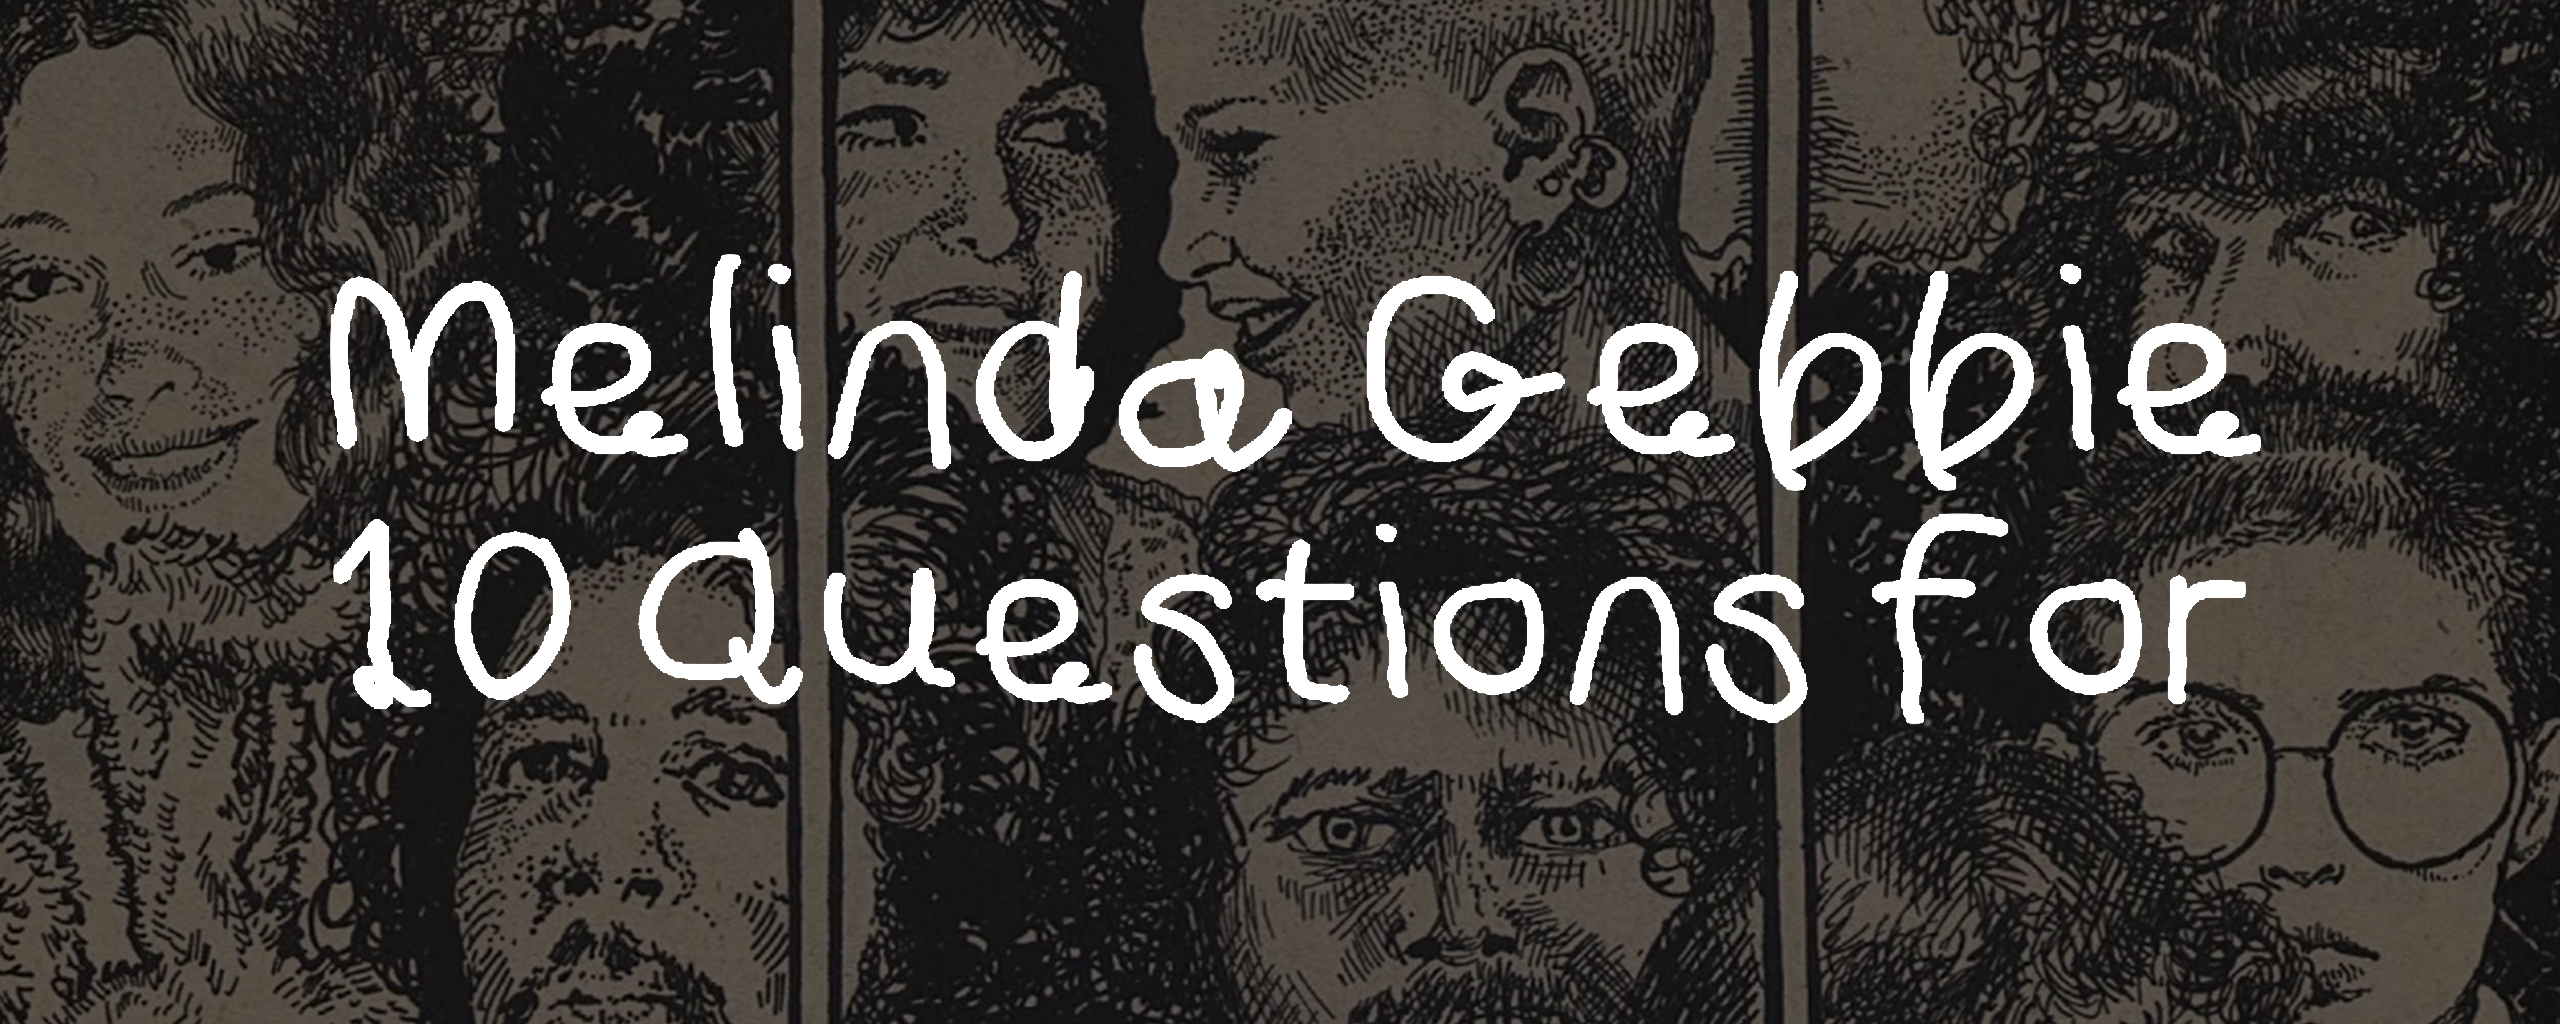 10 Questions for Melinda Gebbie